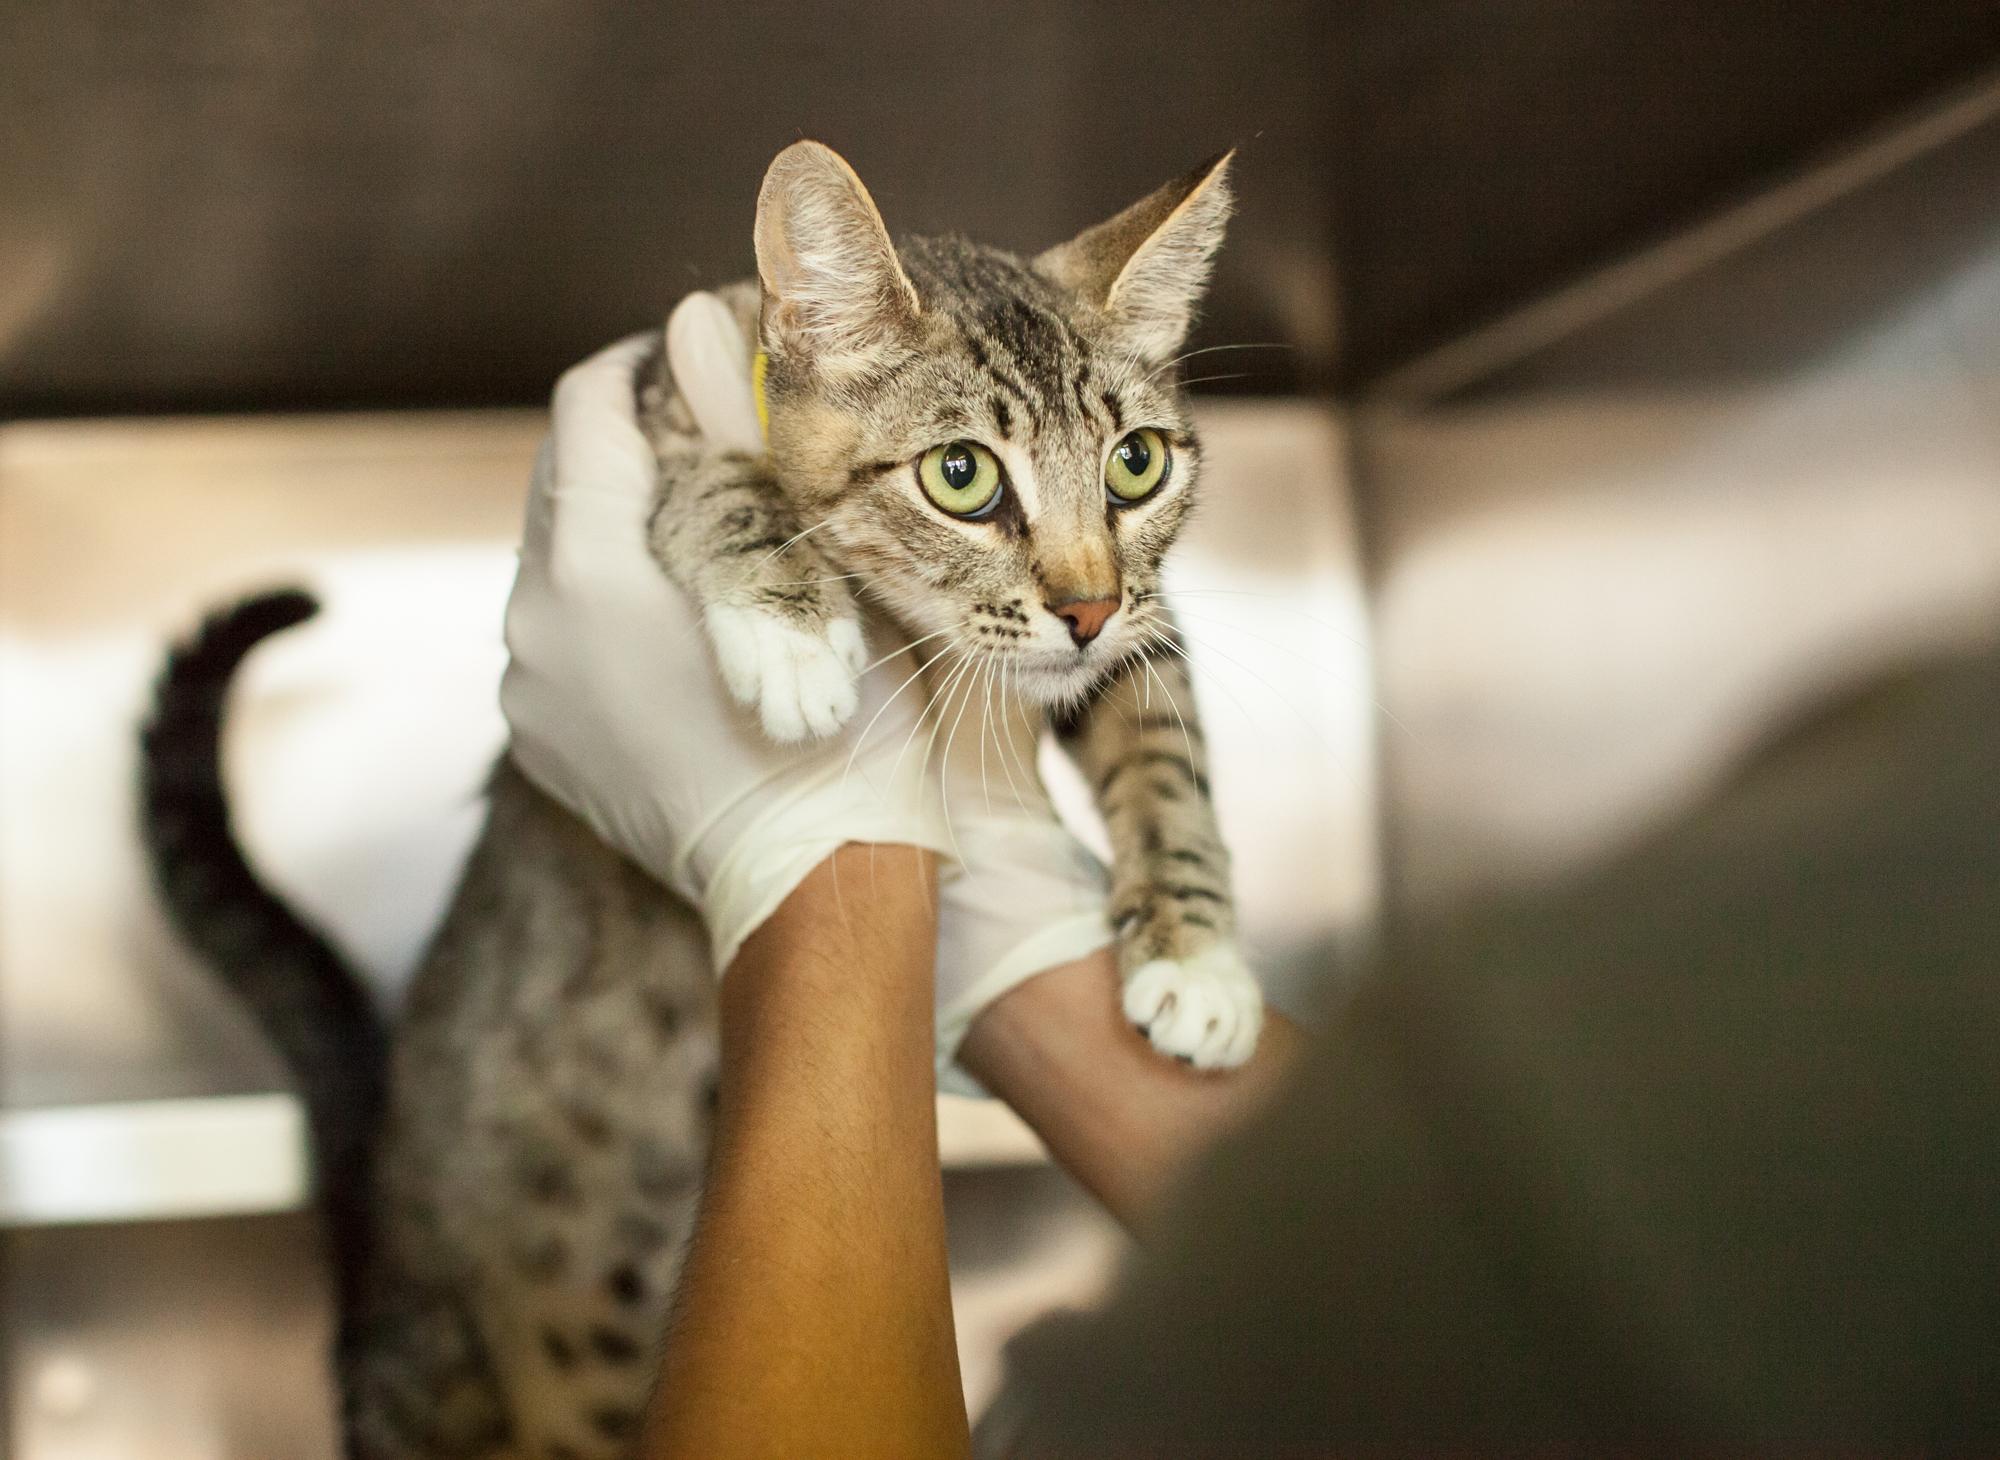 033_animal-photography-cats-dogs-volunteer_MG_5136.jpg